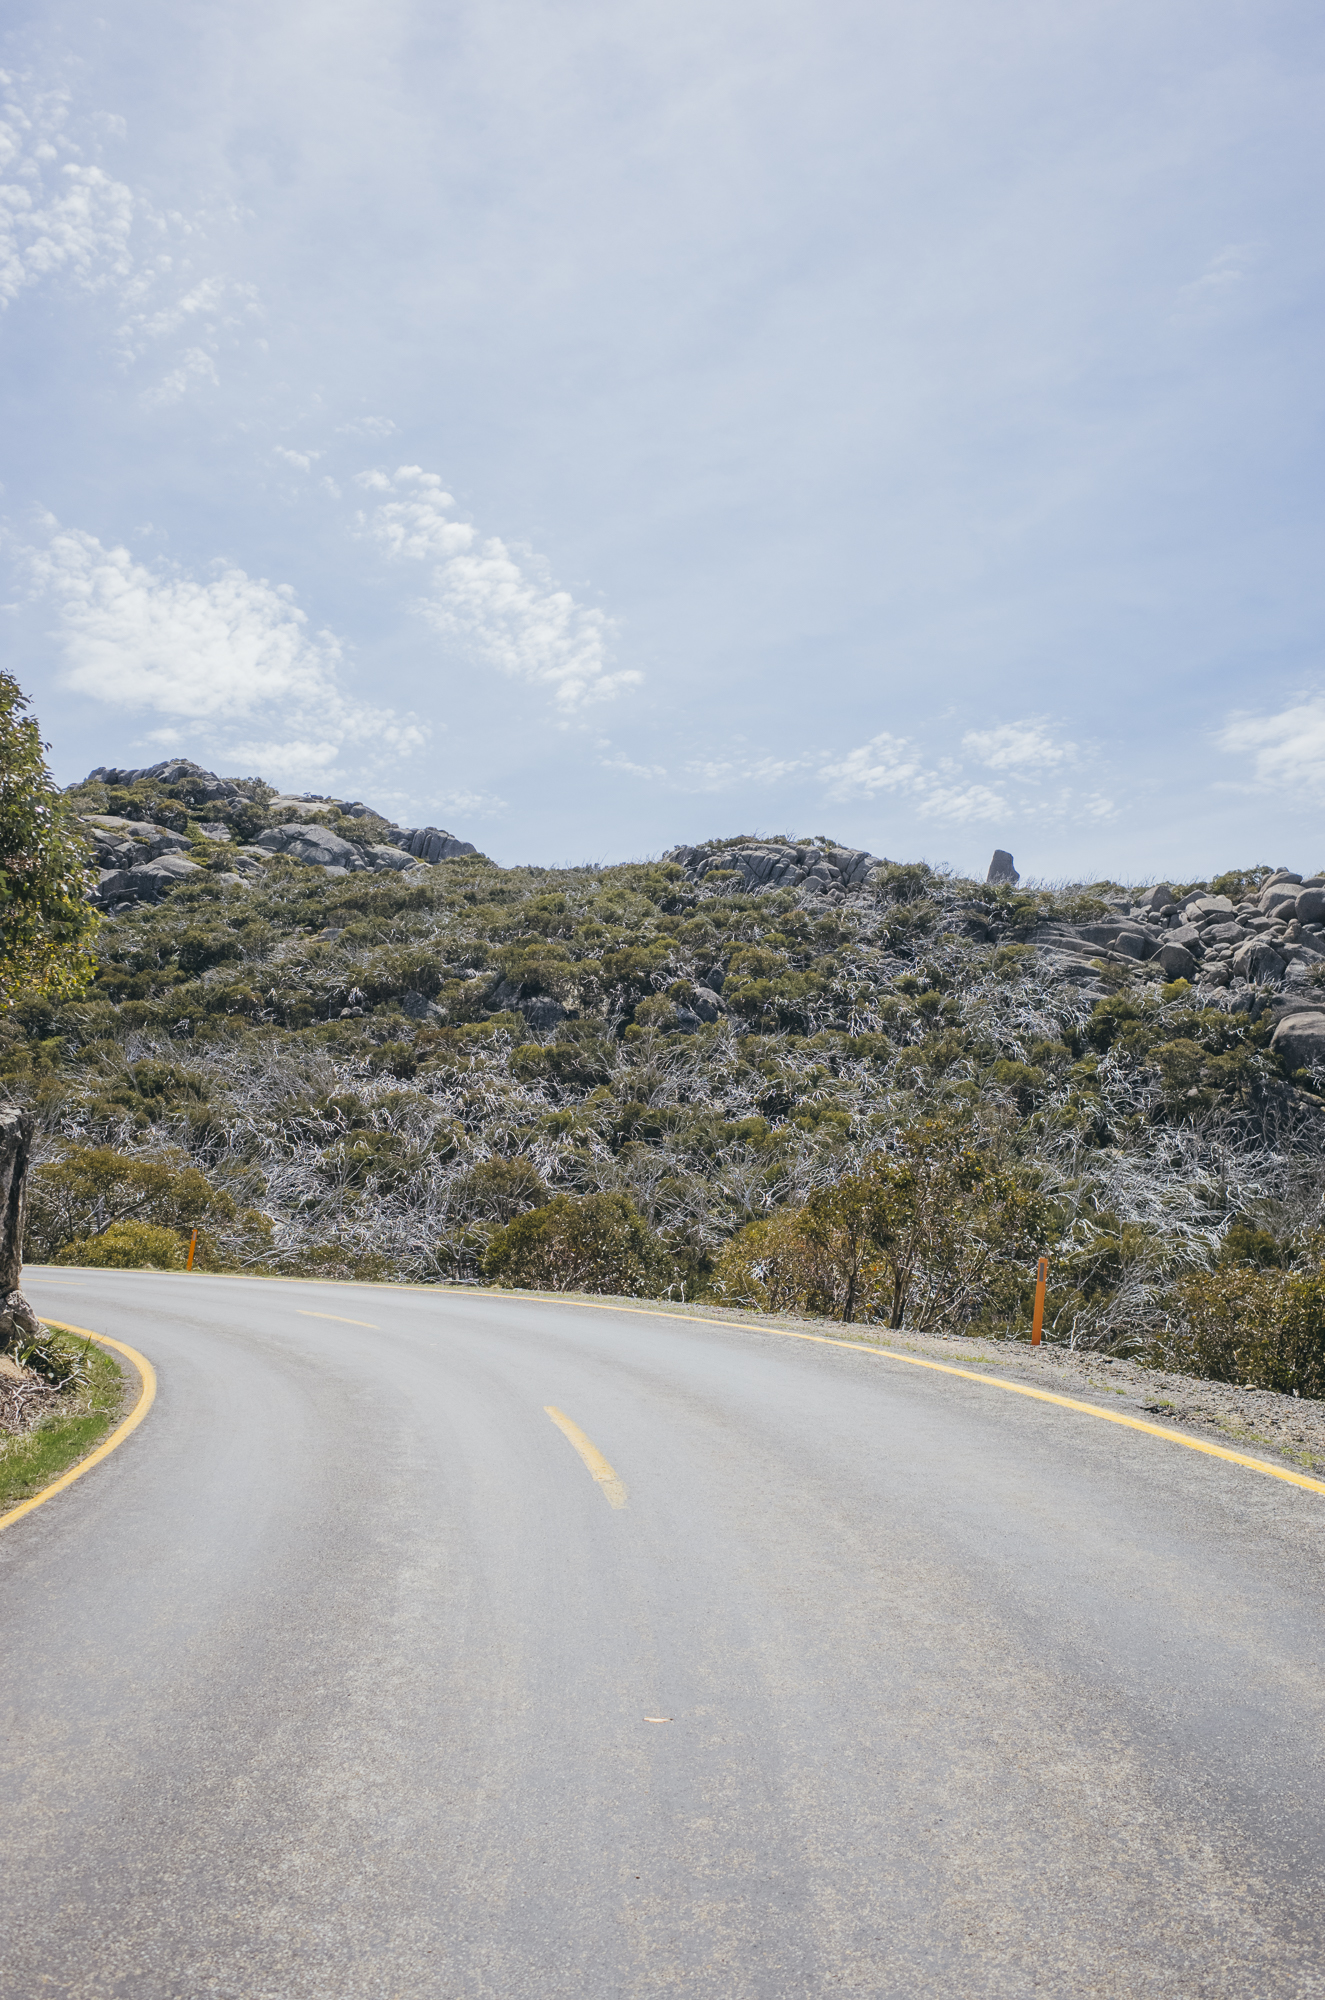 RHC 7 Peaks Soup Boys - Mt Buffalo - Adrian Zanardo - 20 - web.JPG